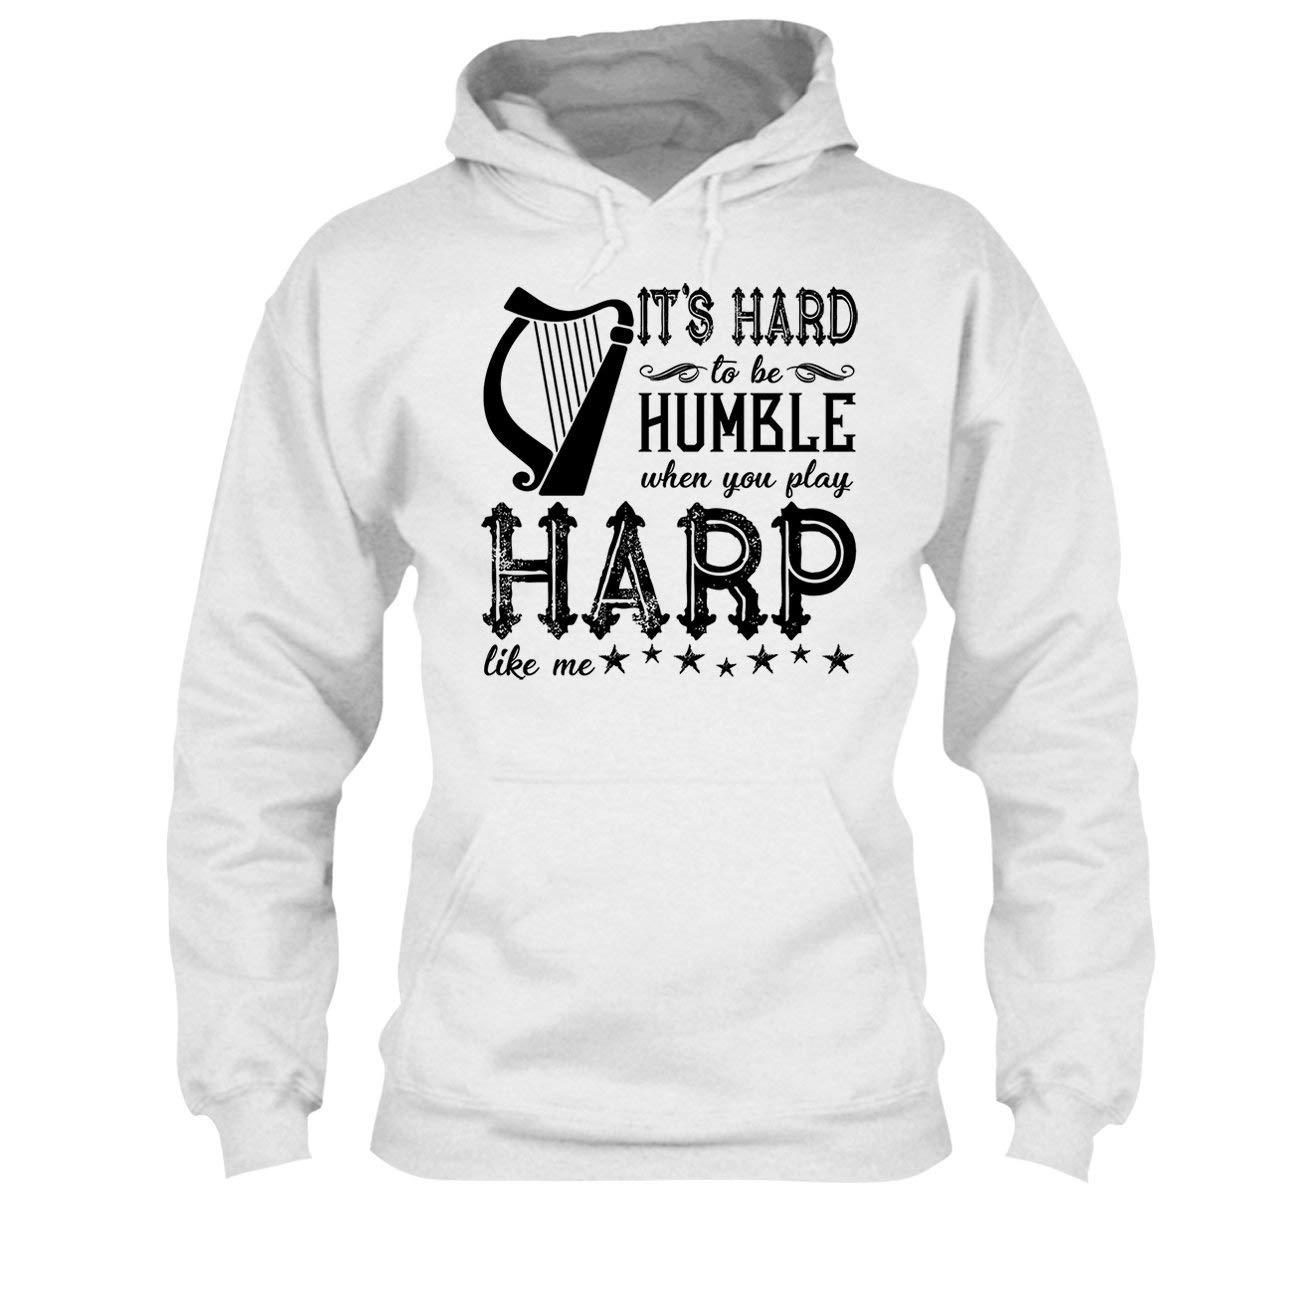 Short Sleeve Shirts to Play Harp Like Me Tee Shirt